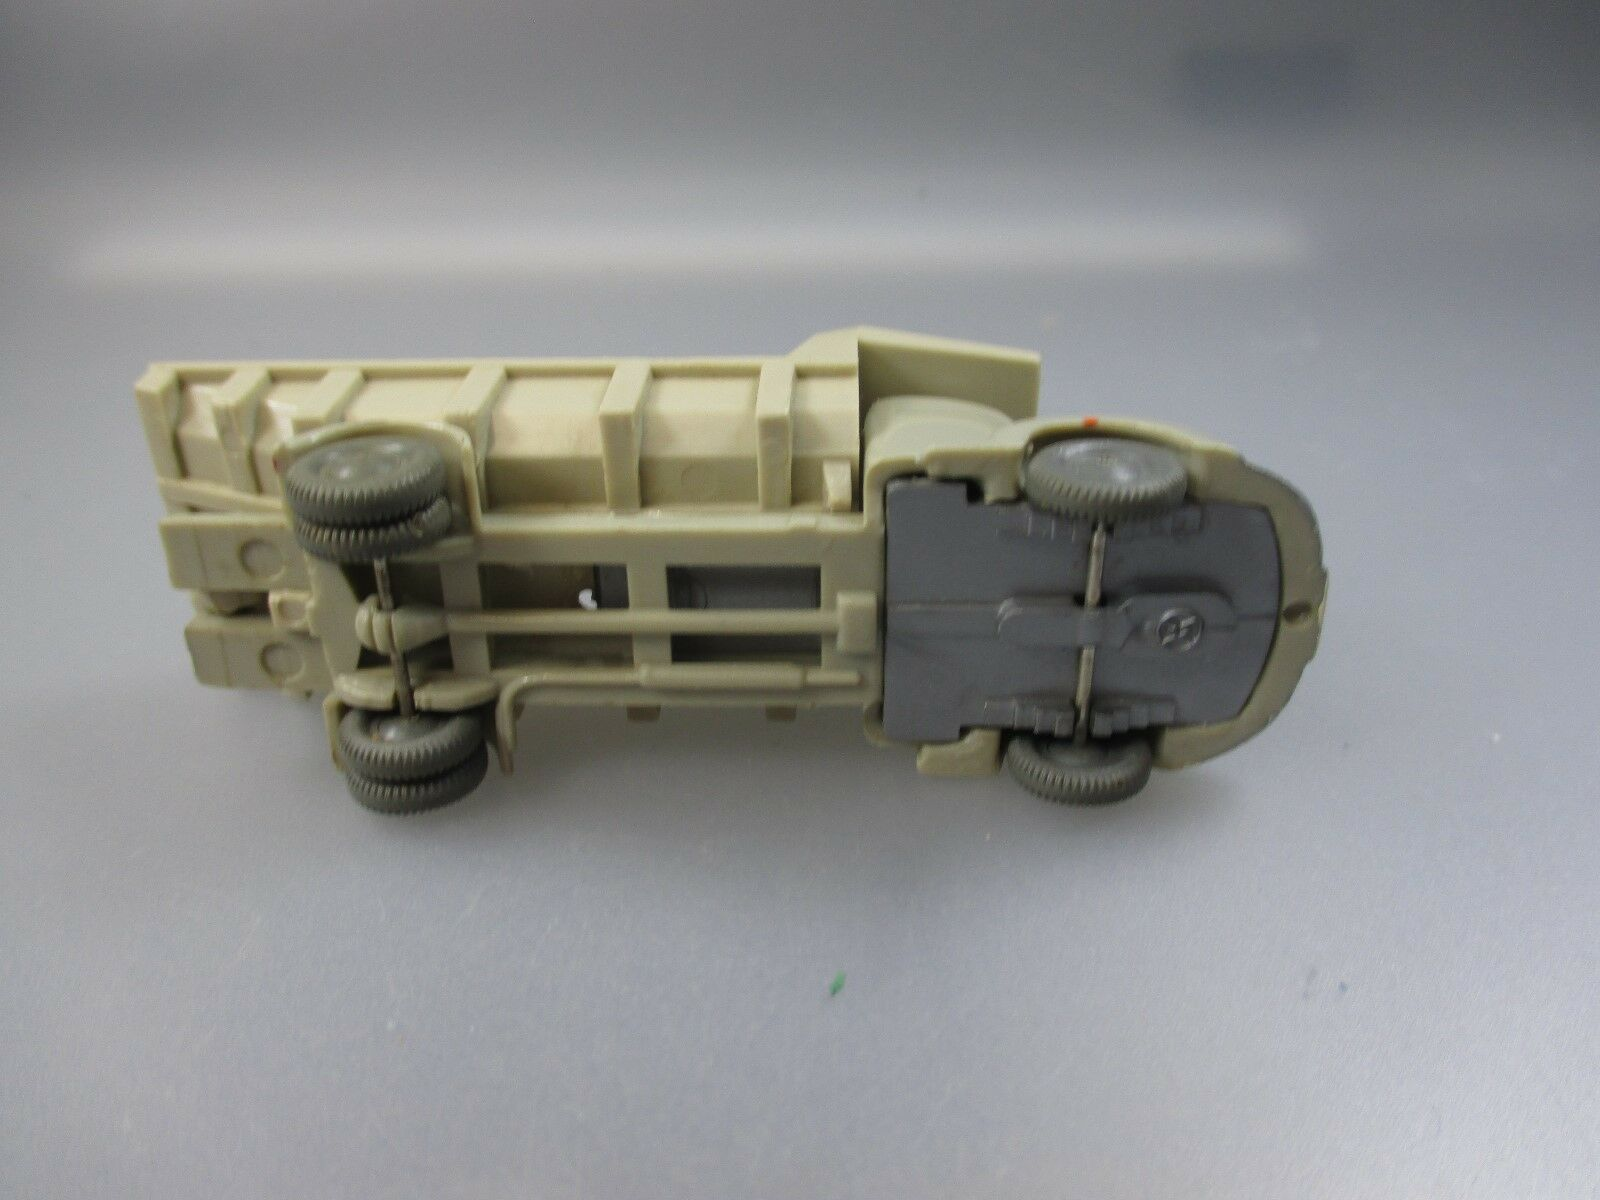 Wiking  MB l 3500 hinterkipper (impulso (impulso (impulso 51) ba8cee